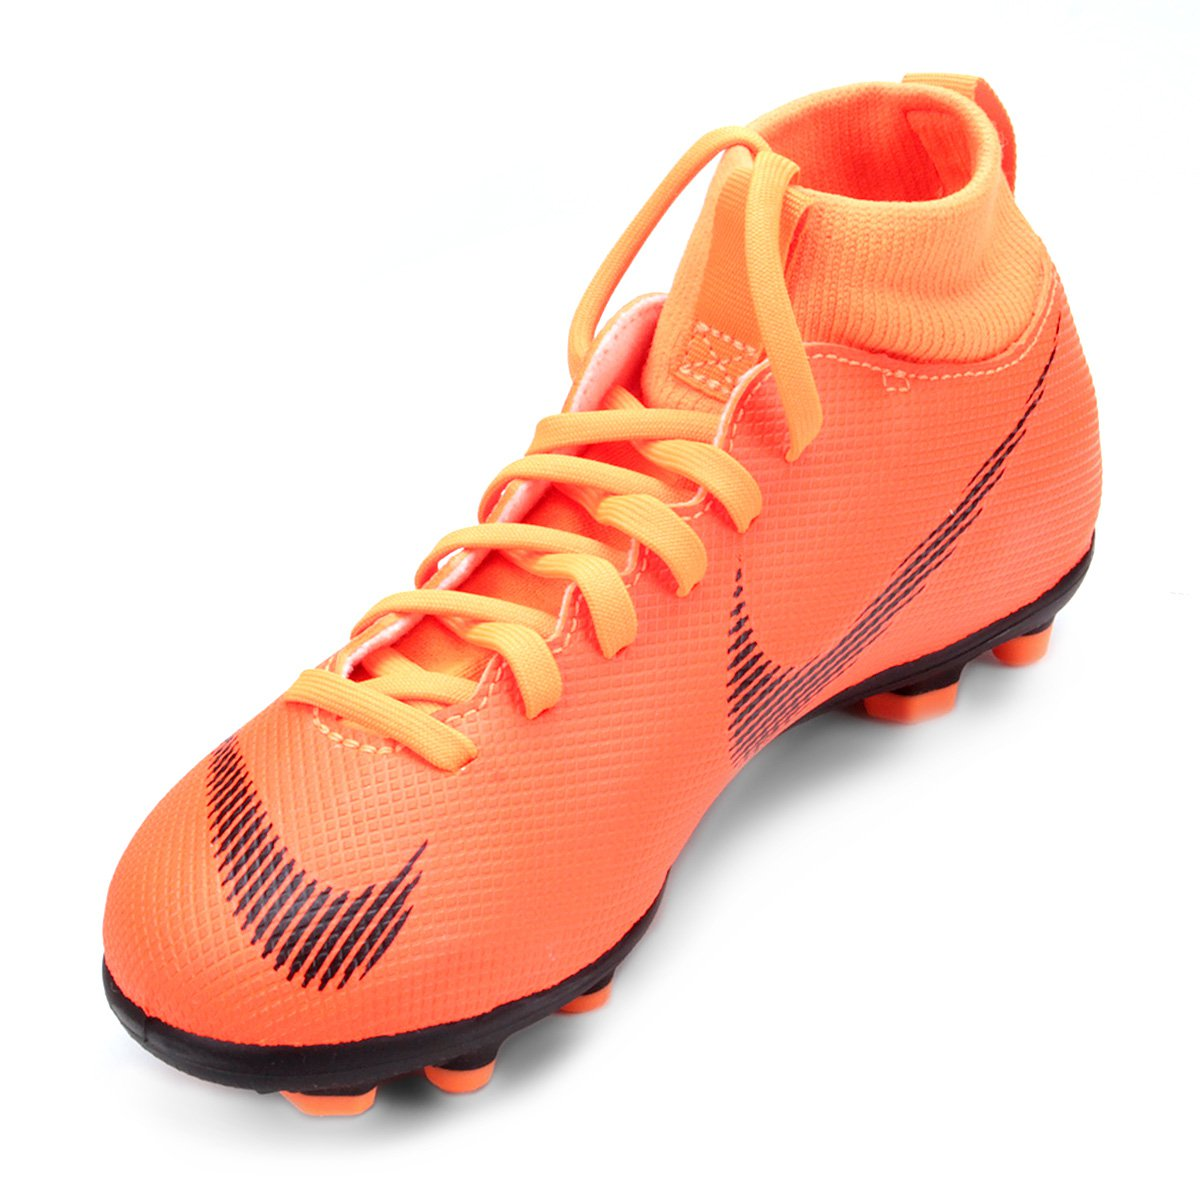 Chuteira Campo Infantil Nike Mercurial Superfly 6 Club - Compre ... 2da5071b4457d